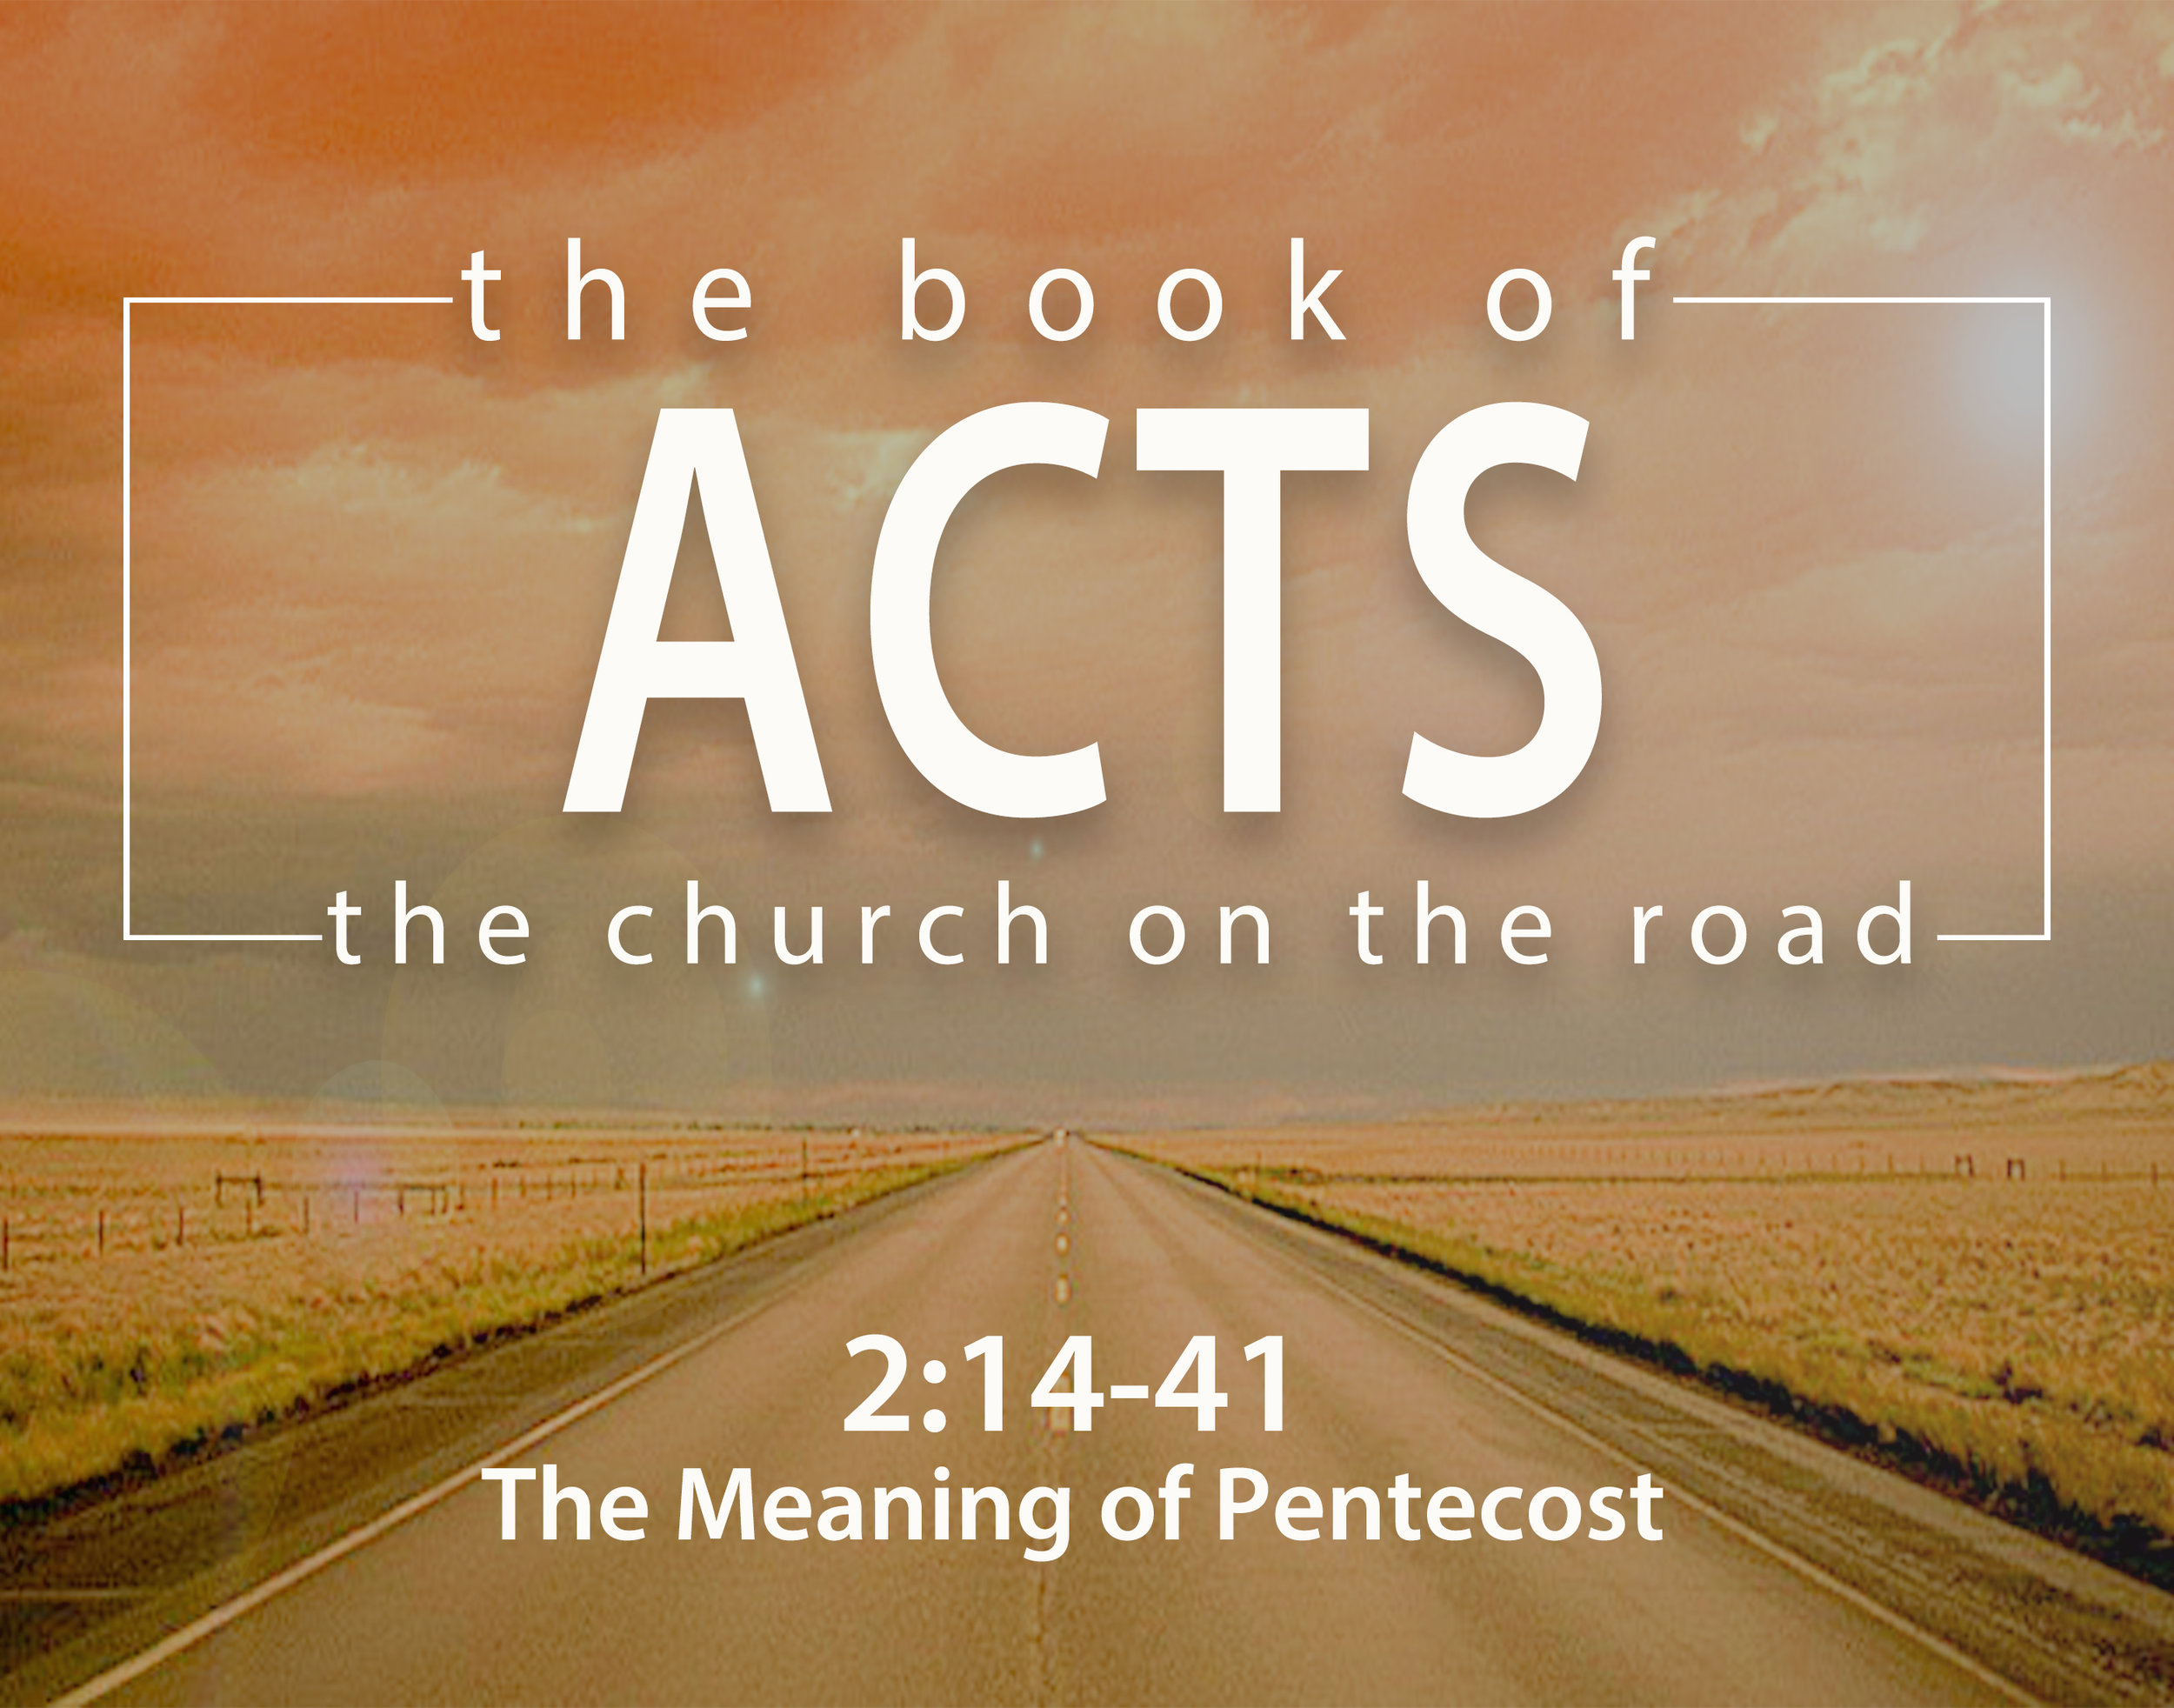 04Meaning of Pentecost.jpg